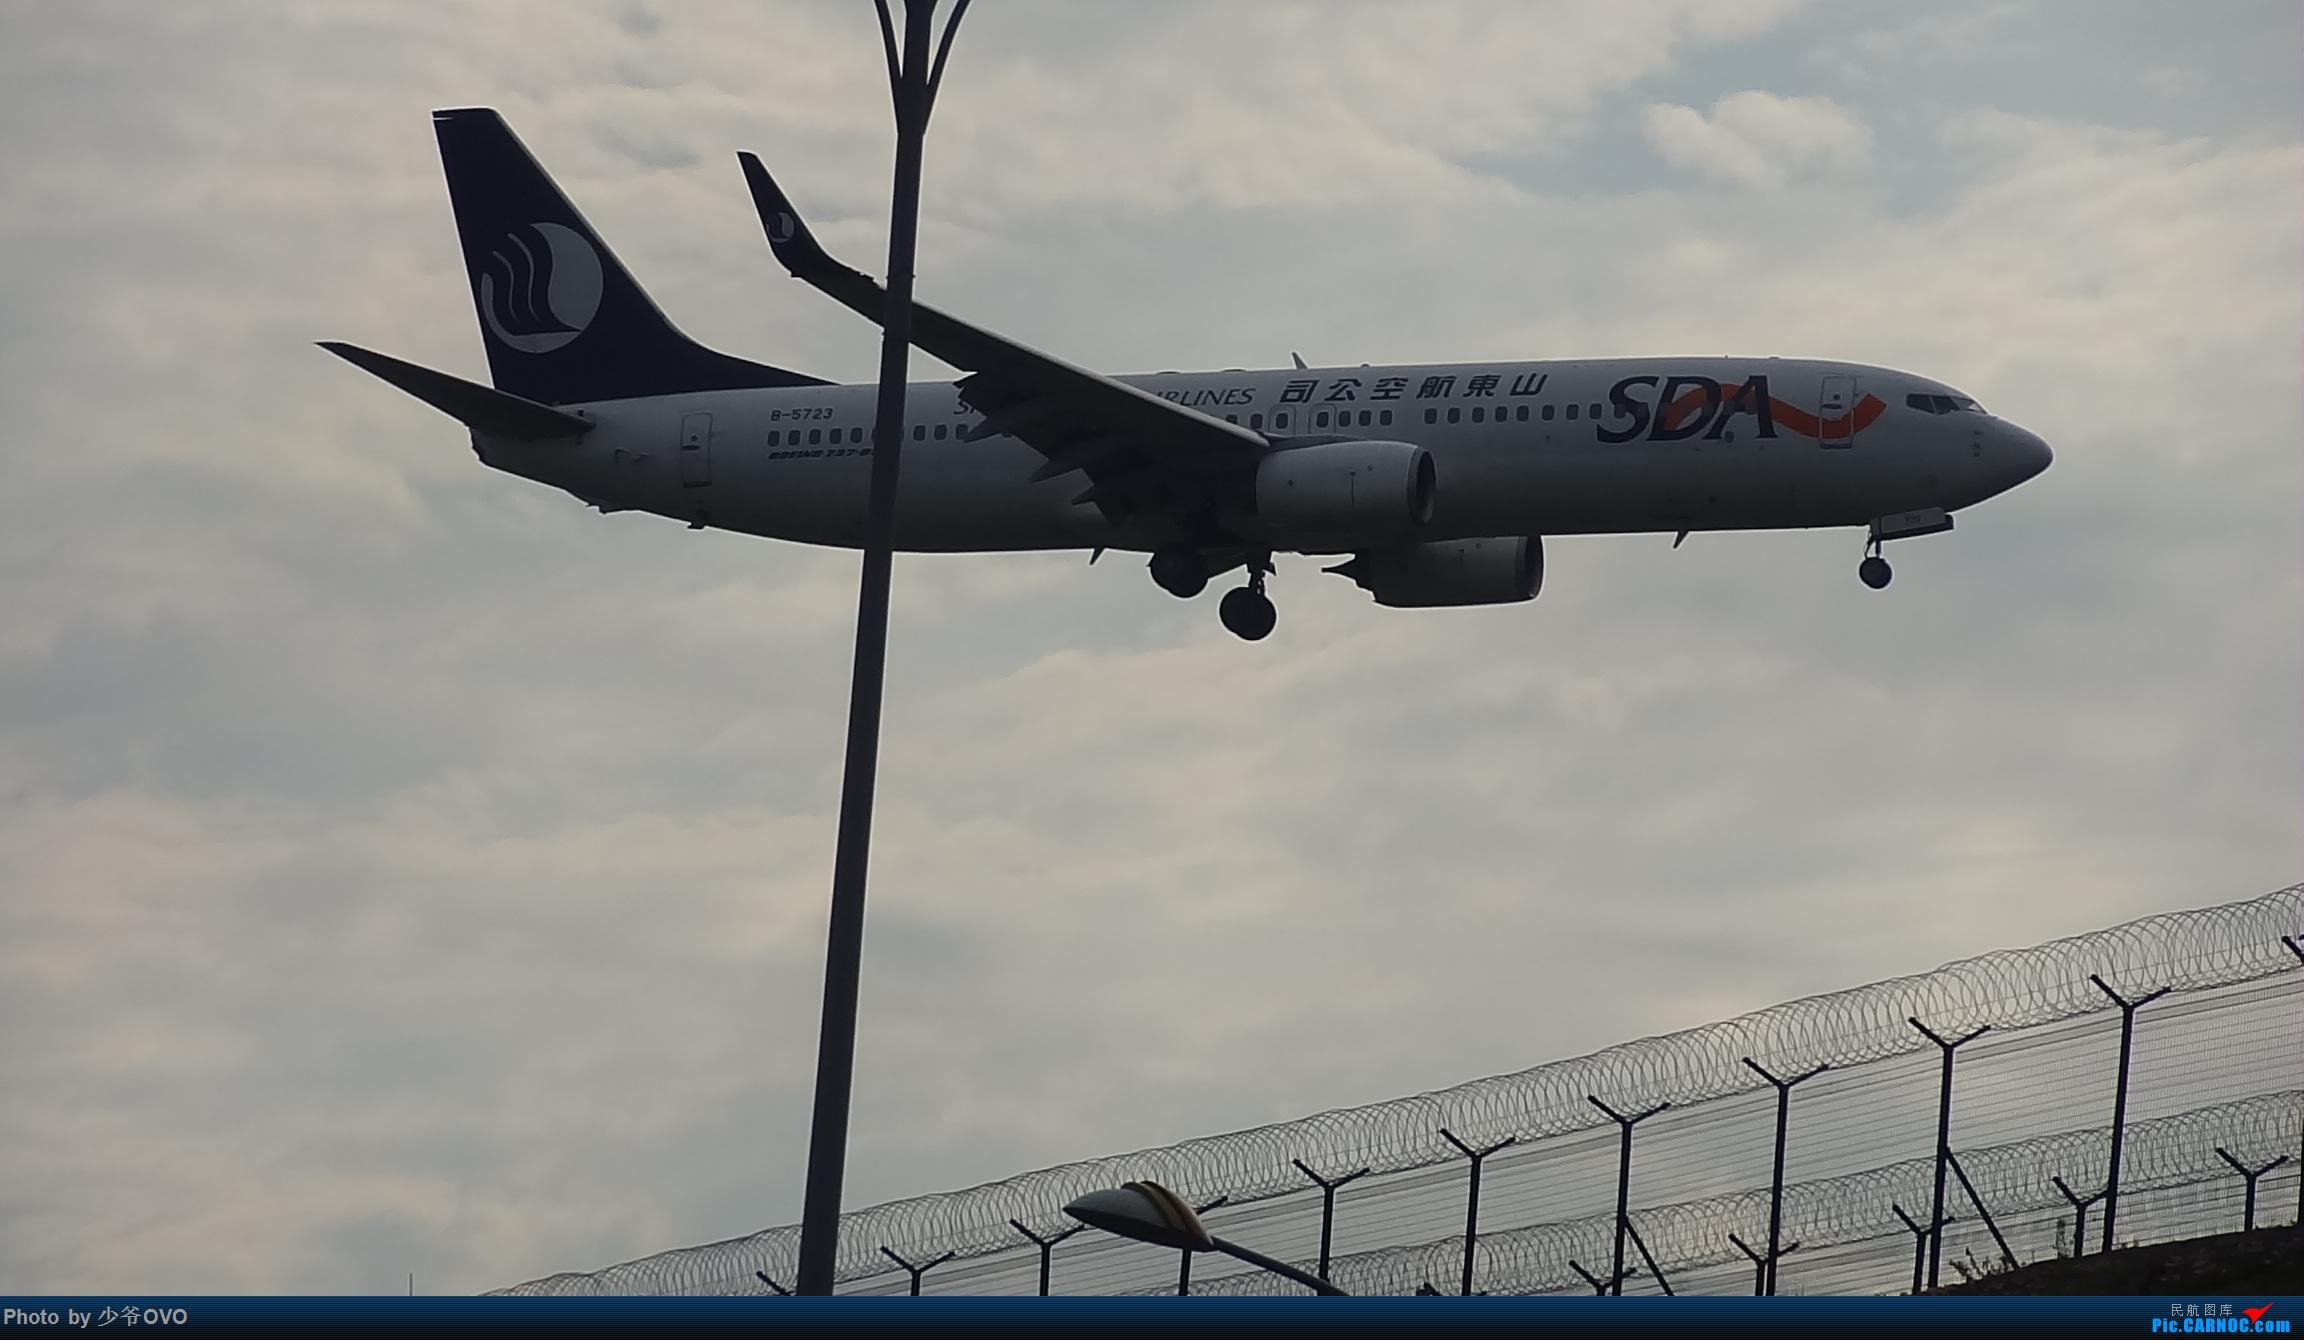 Re:[原创]CKG拍机,数码机最后的倔强 BOEING 737-800 B-5723 中国重庆江北国际机场